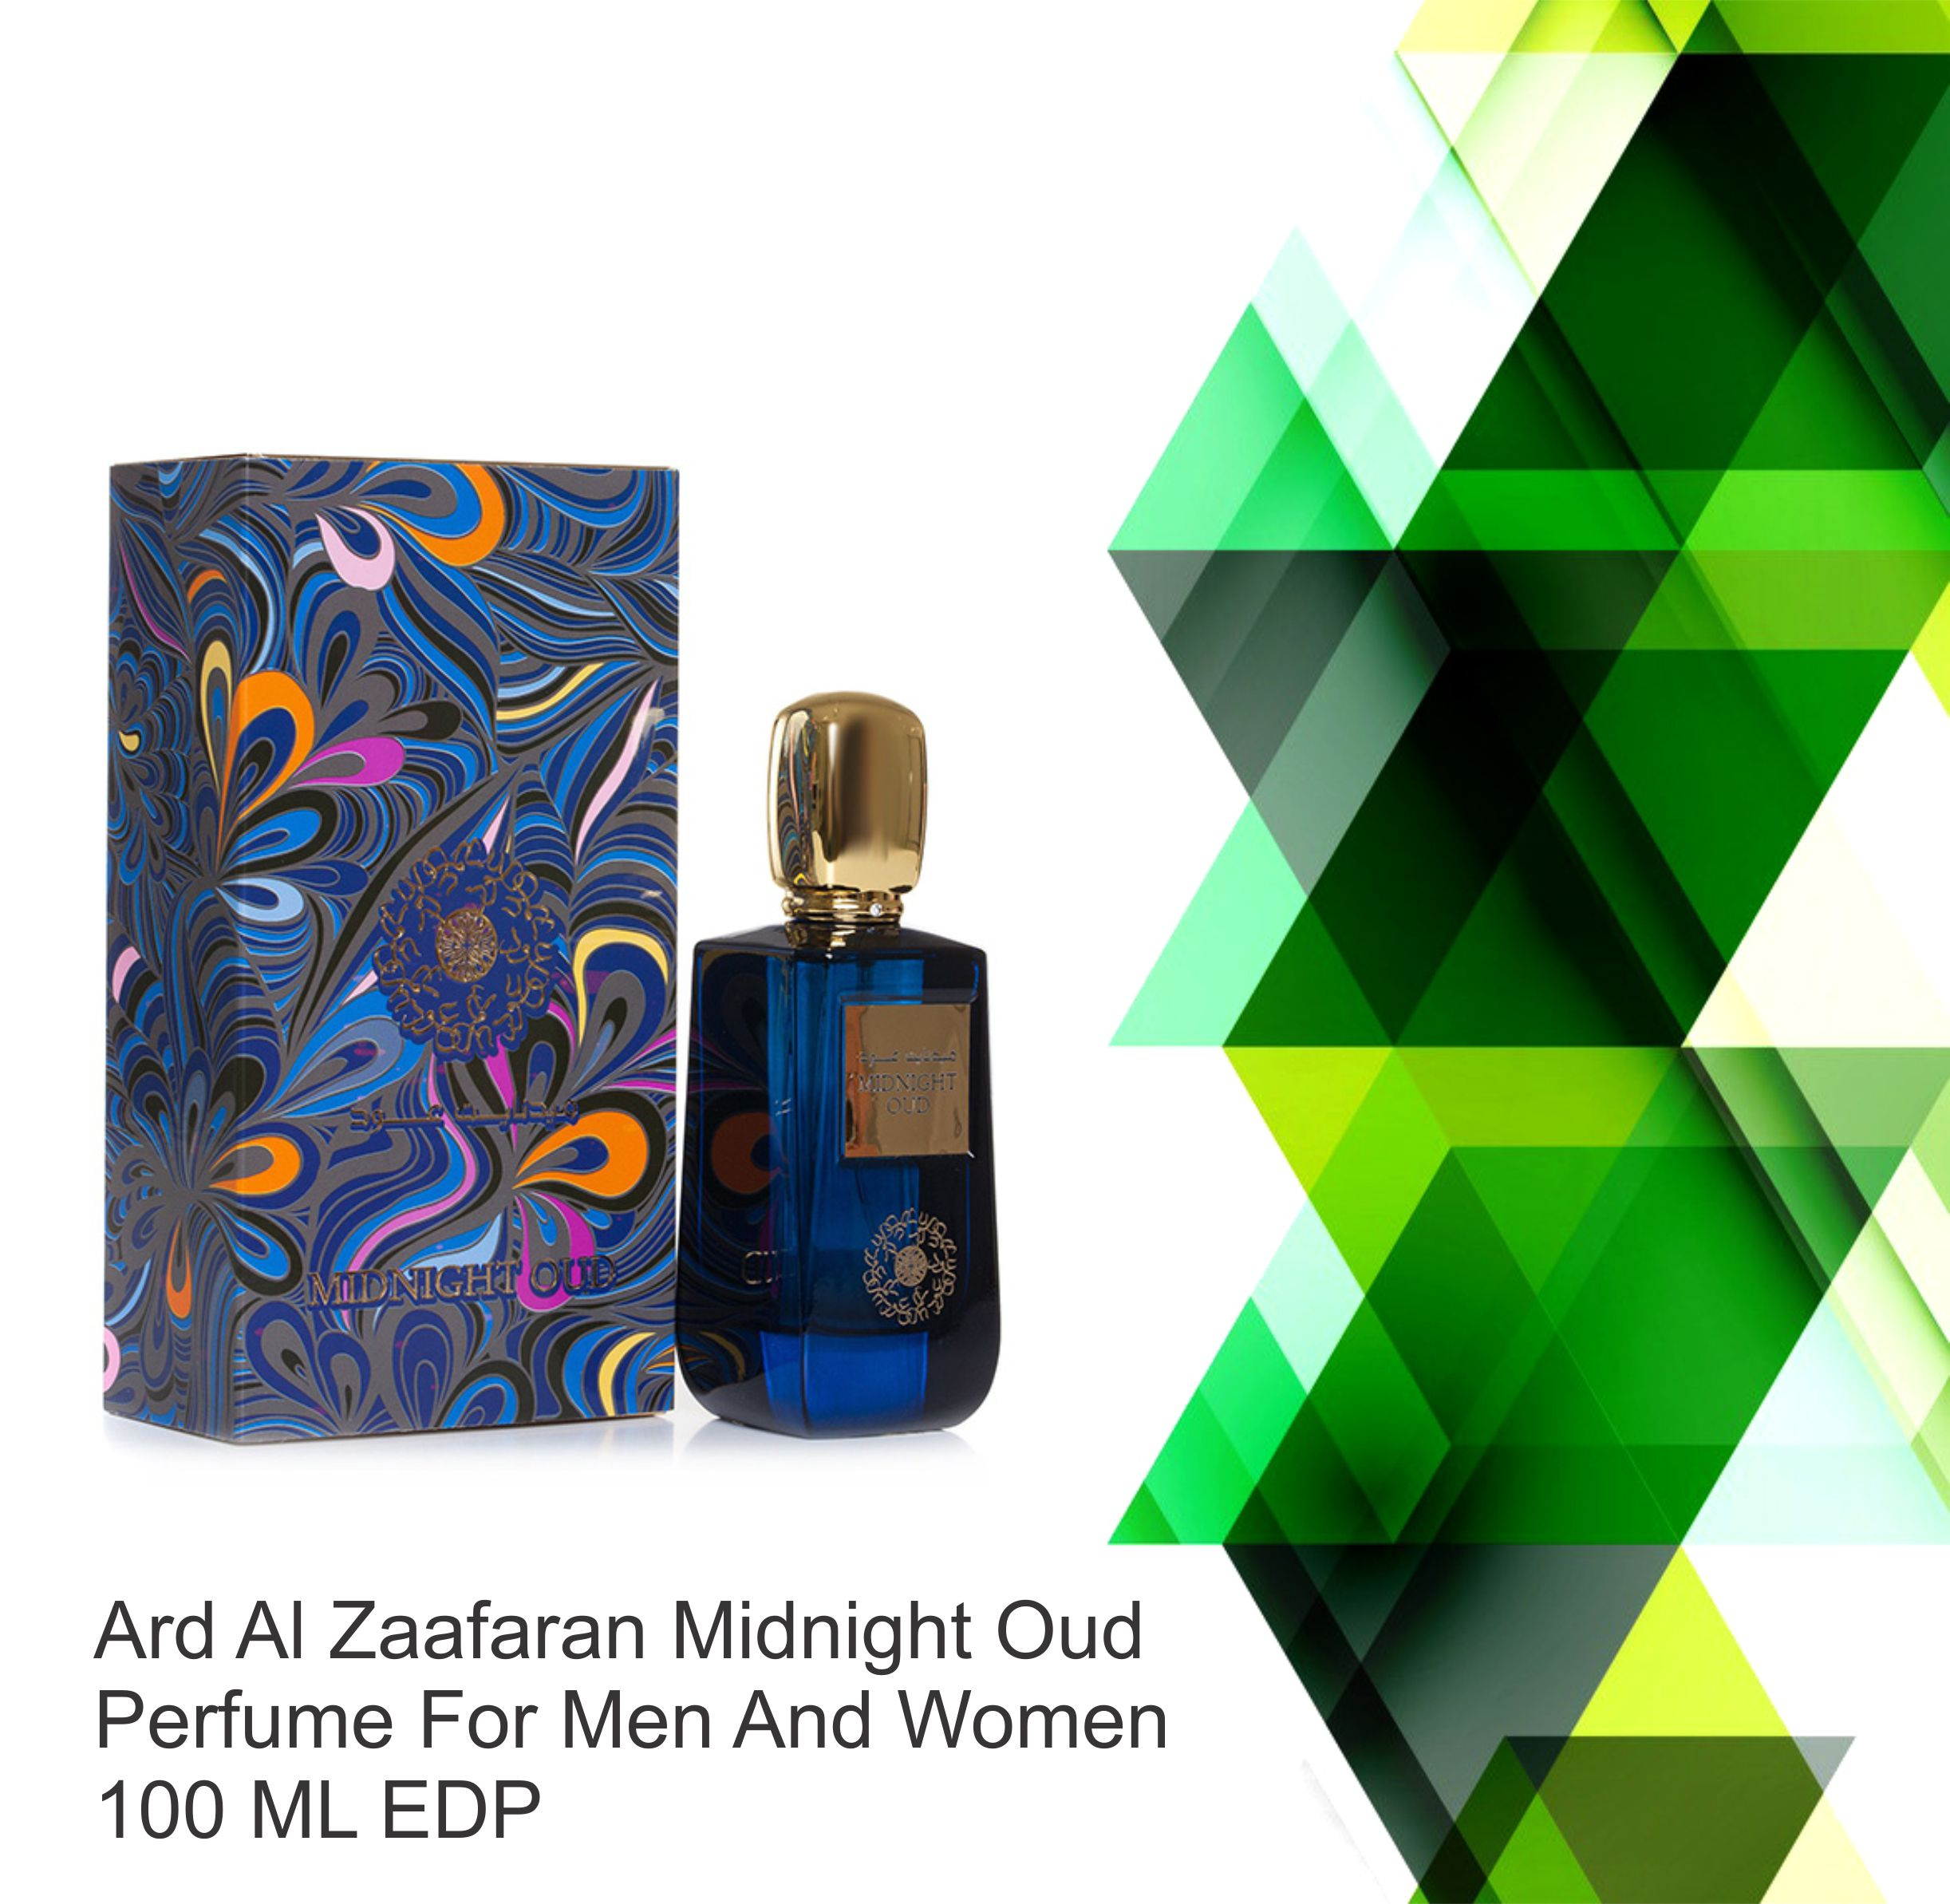 ard-al-zaafaran-midnight-oud-perfume-for-men-and-women-100-ml-edp